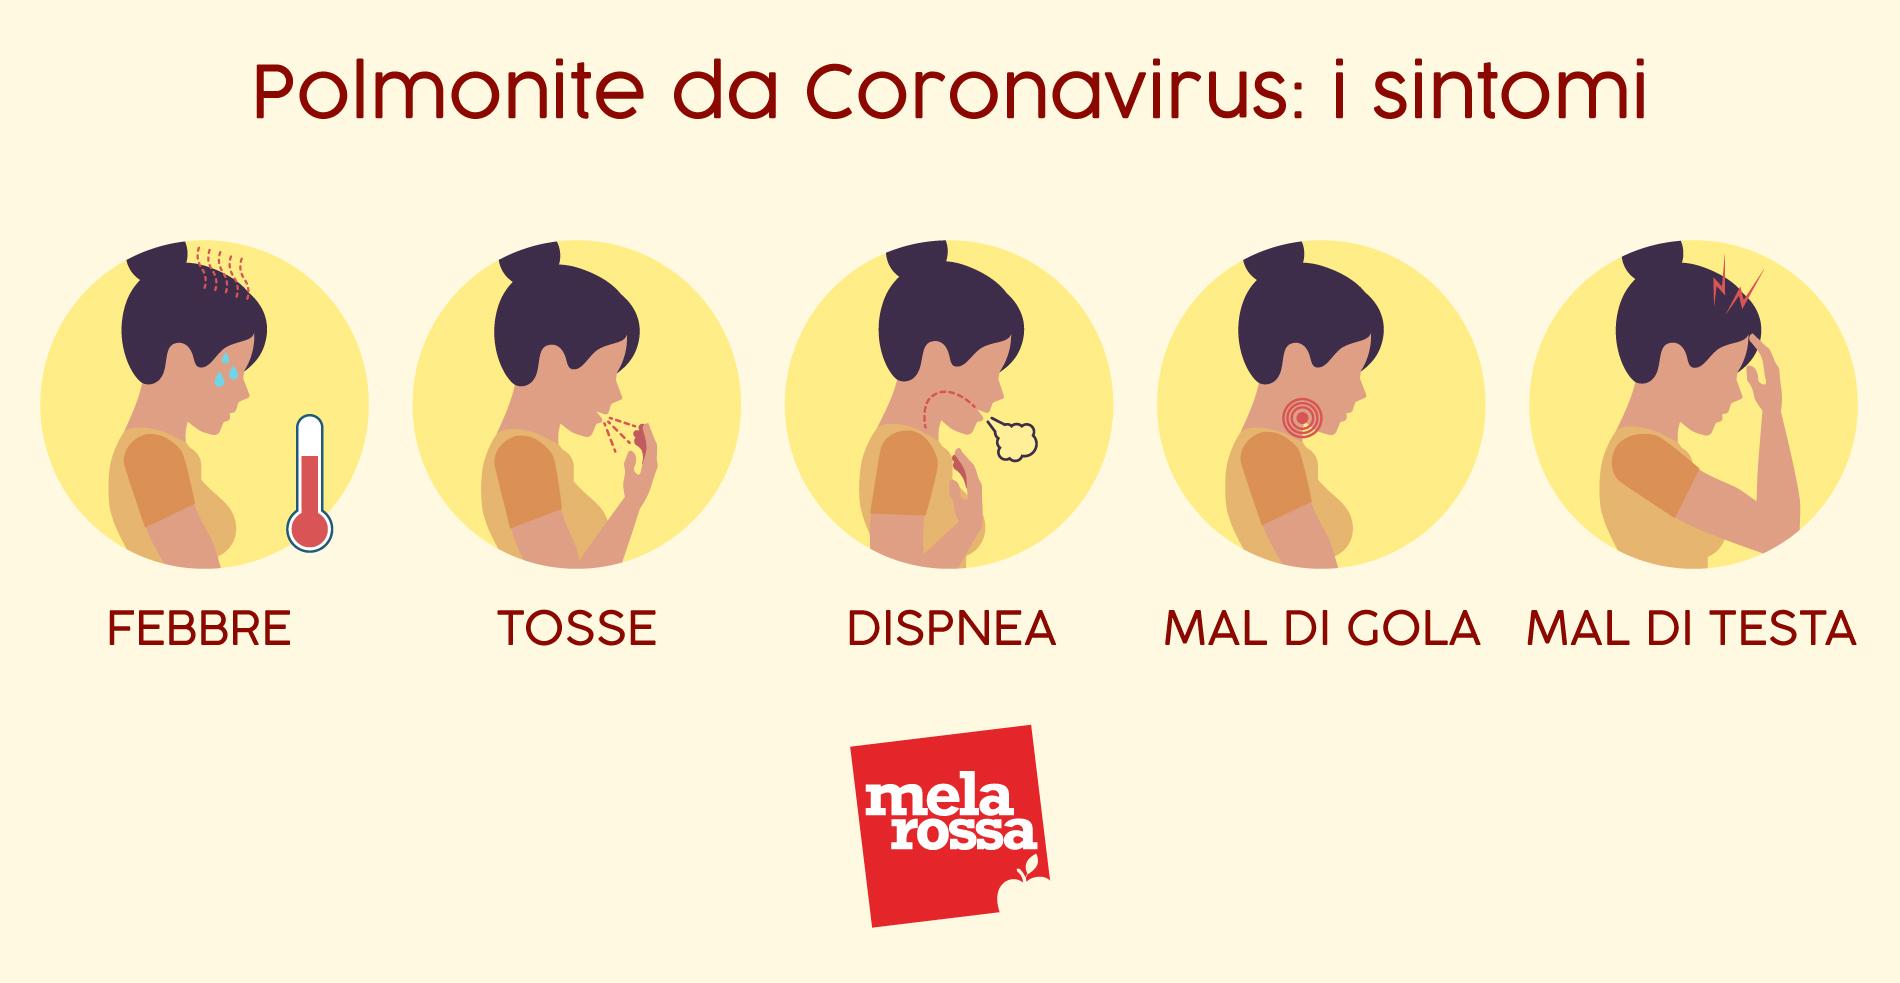 polmonite da coronavirus: sintomi